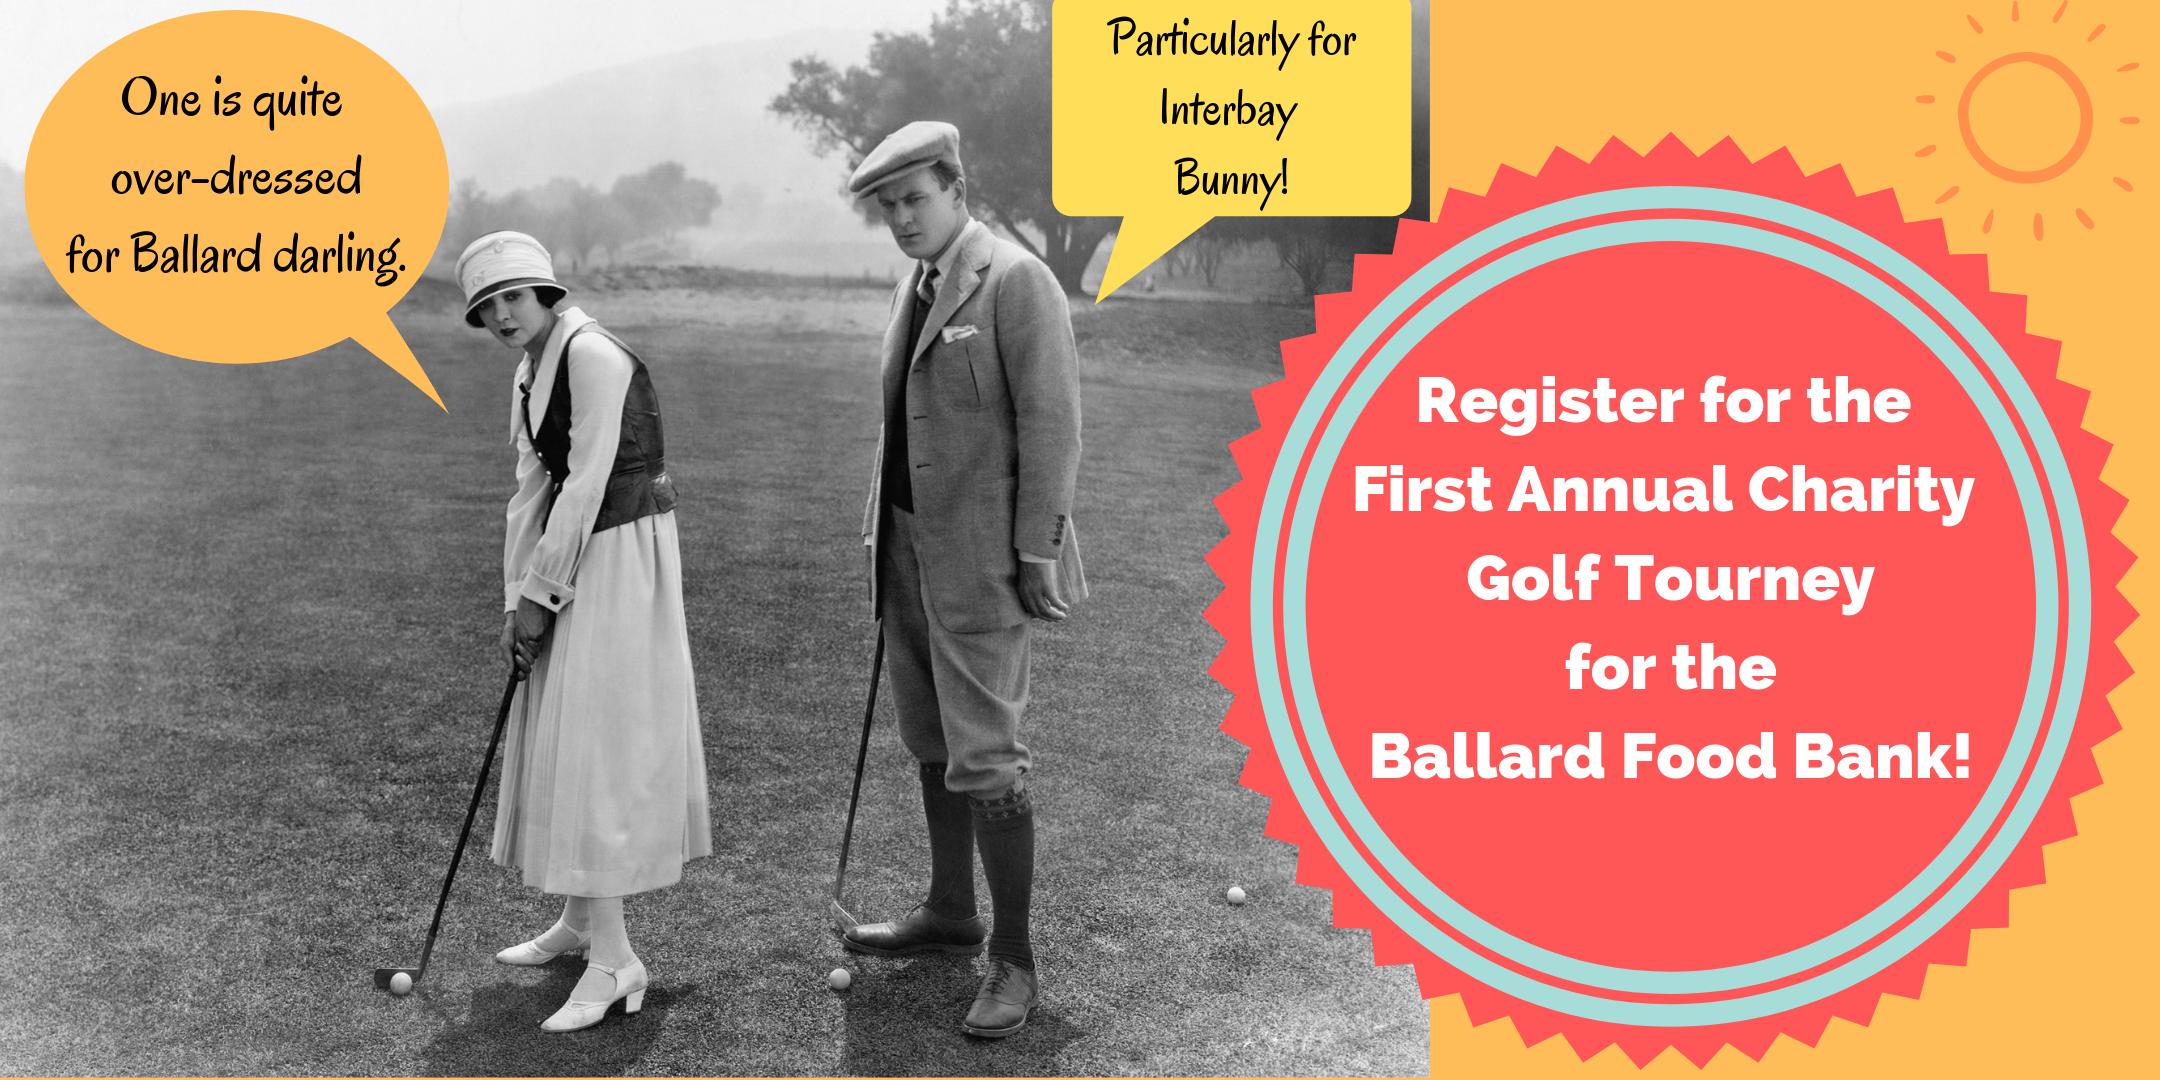 Charity golf event for the Ballard Food Bank